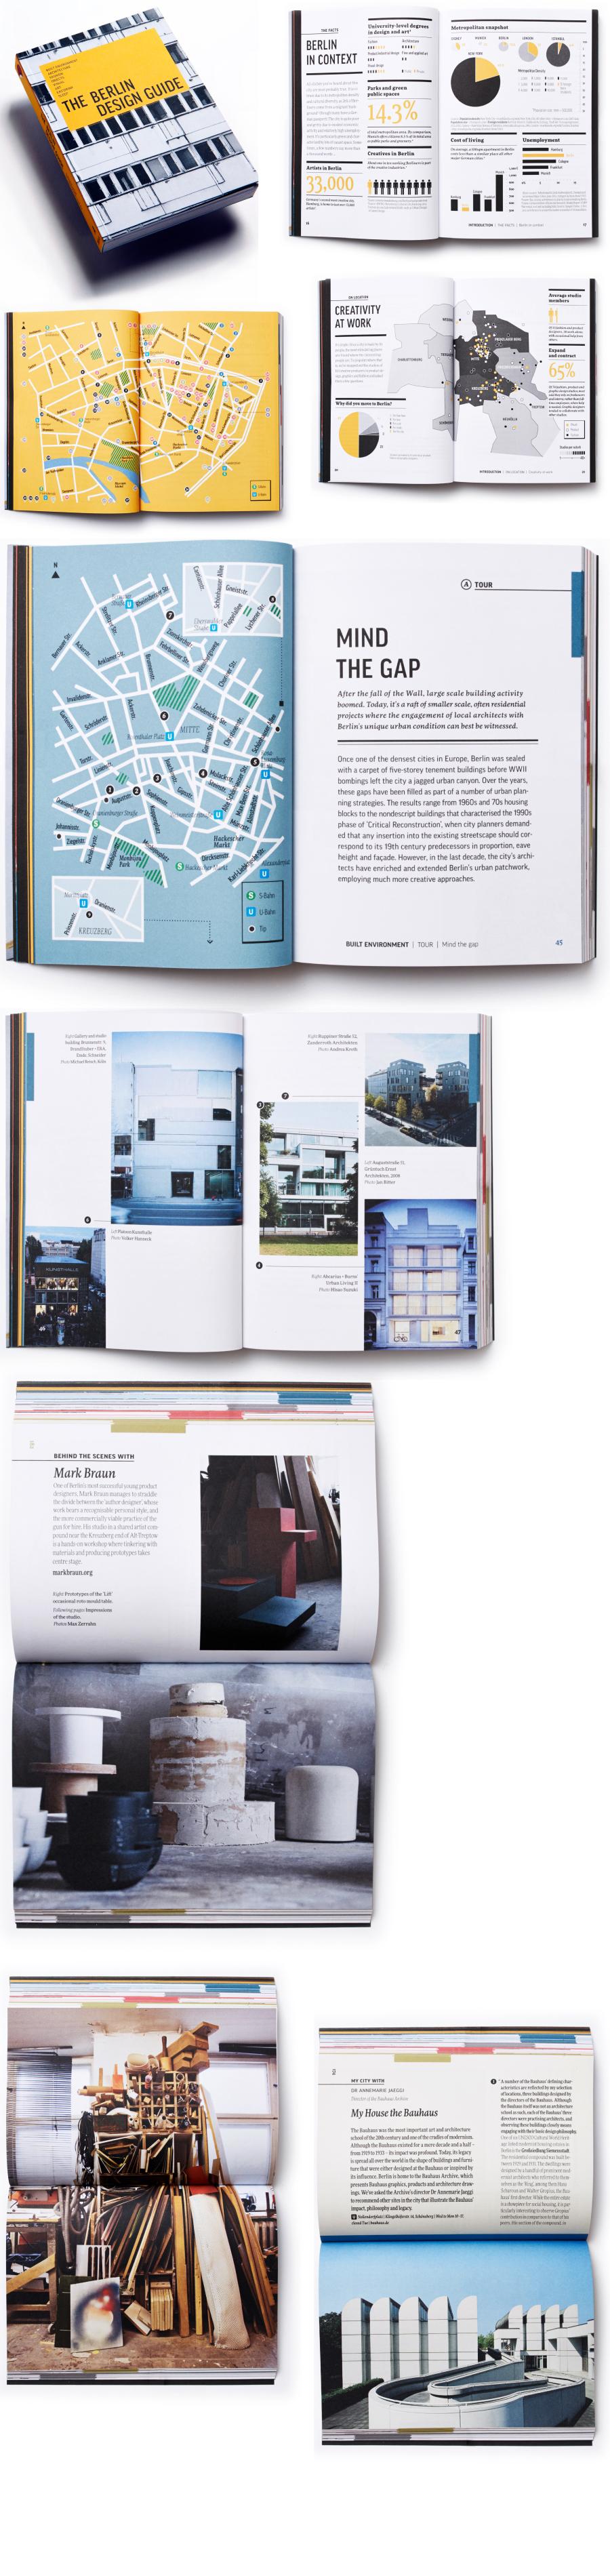 The Berlin Design Guide